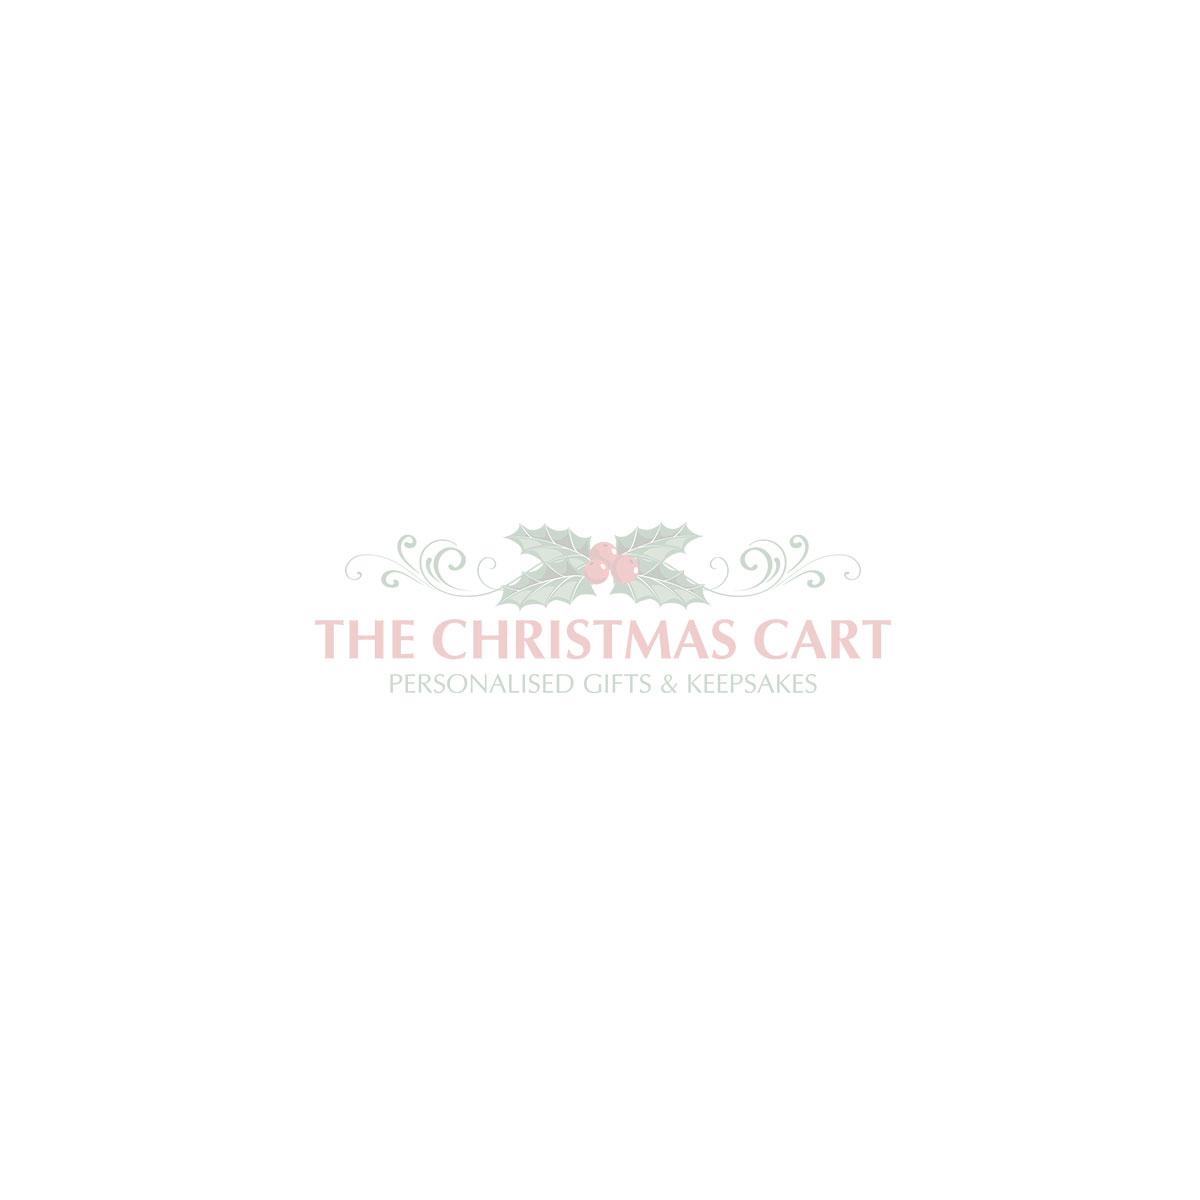 Personalised White Linen Santa Sack Tag with Burlap Piping